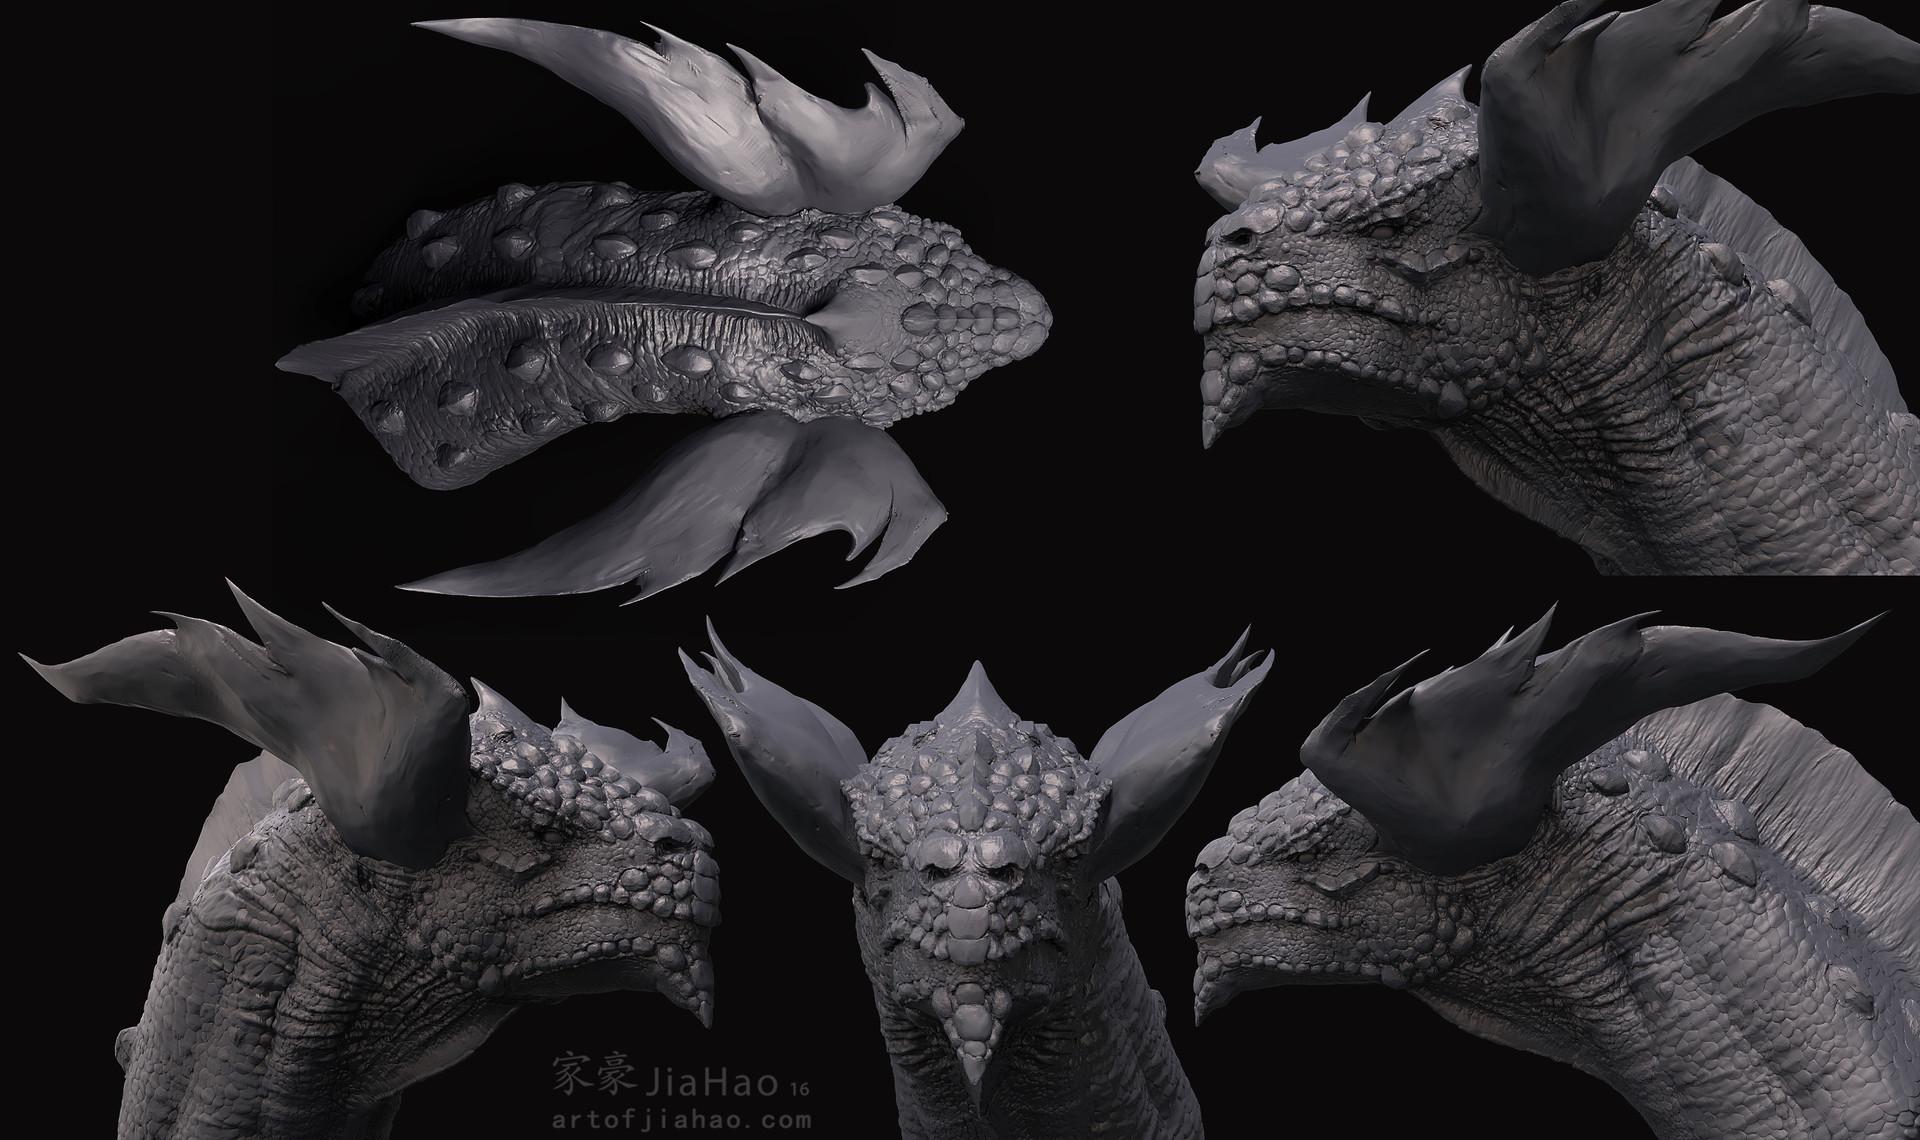 Jia hao 2016 07 dragonbust designpresentation